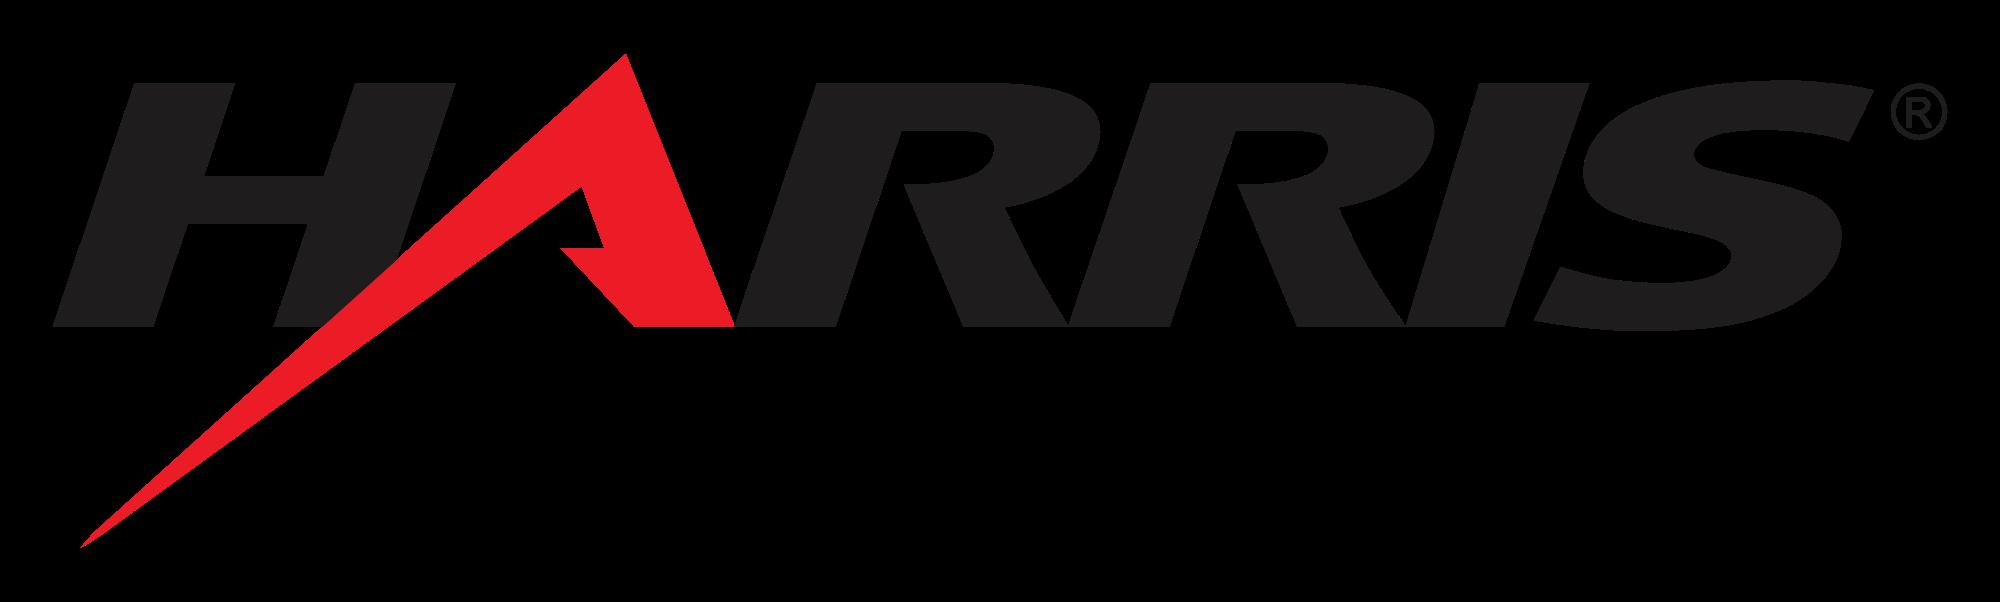 Harris_Corporation_Logo.png